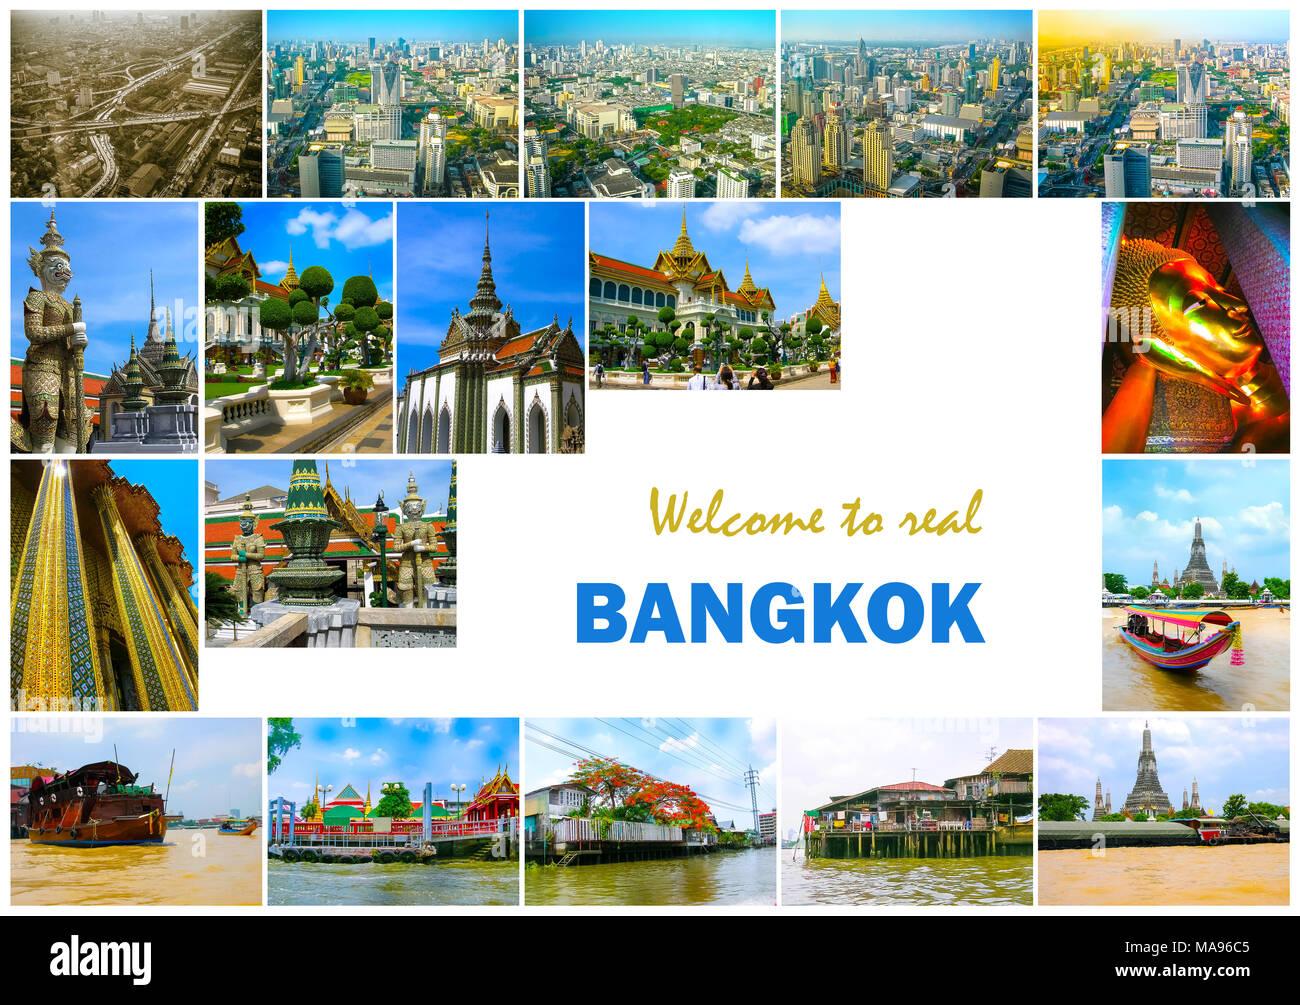 Collage of landmarks of Bangkok, Thailand. - Stock Image